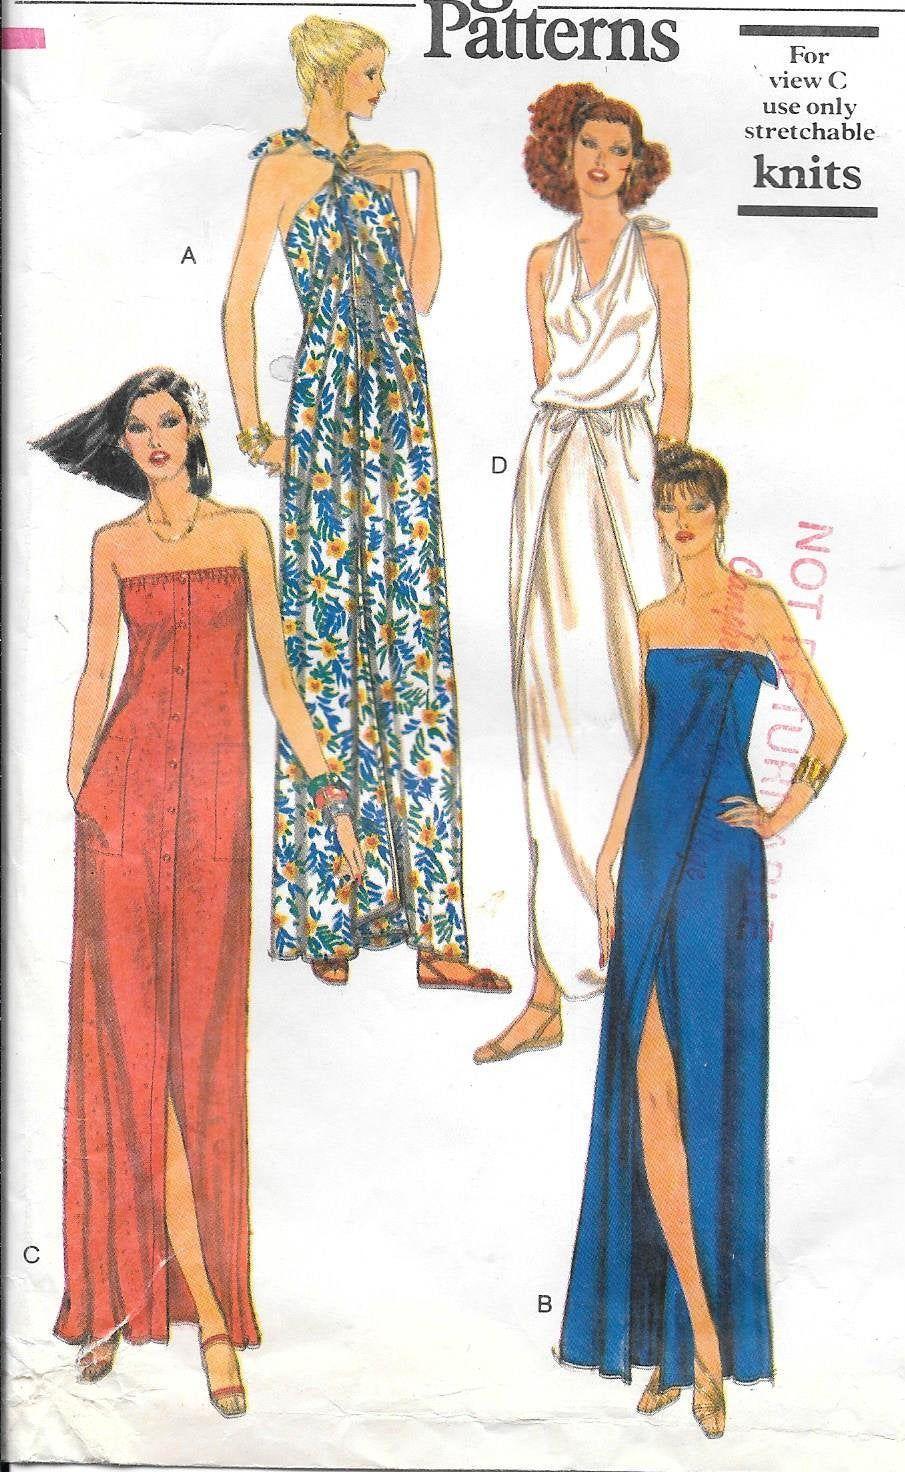 1970s Vogue 7112 Long Wrap Dress Strapless Halter Or Drape Neckline Vintage Sewing Pattern Si Maxi Dress Pattern Sewing Long Knitted Dress Vogue Dress Patterns [ 1472 x 905 Pixel ]